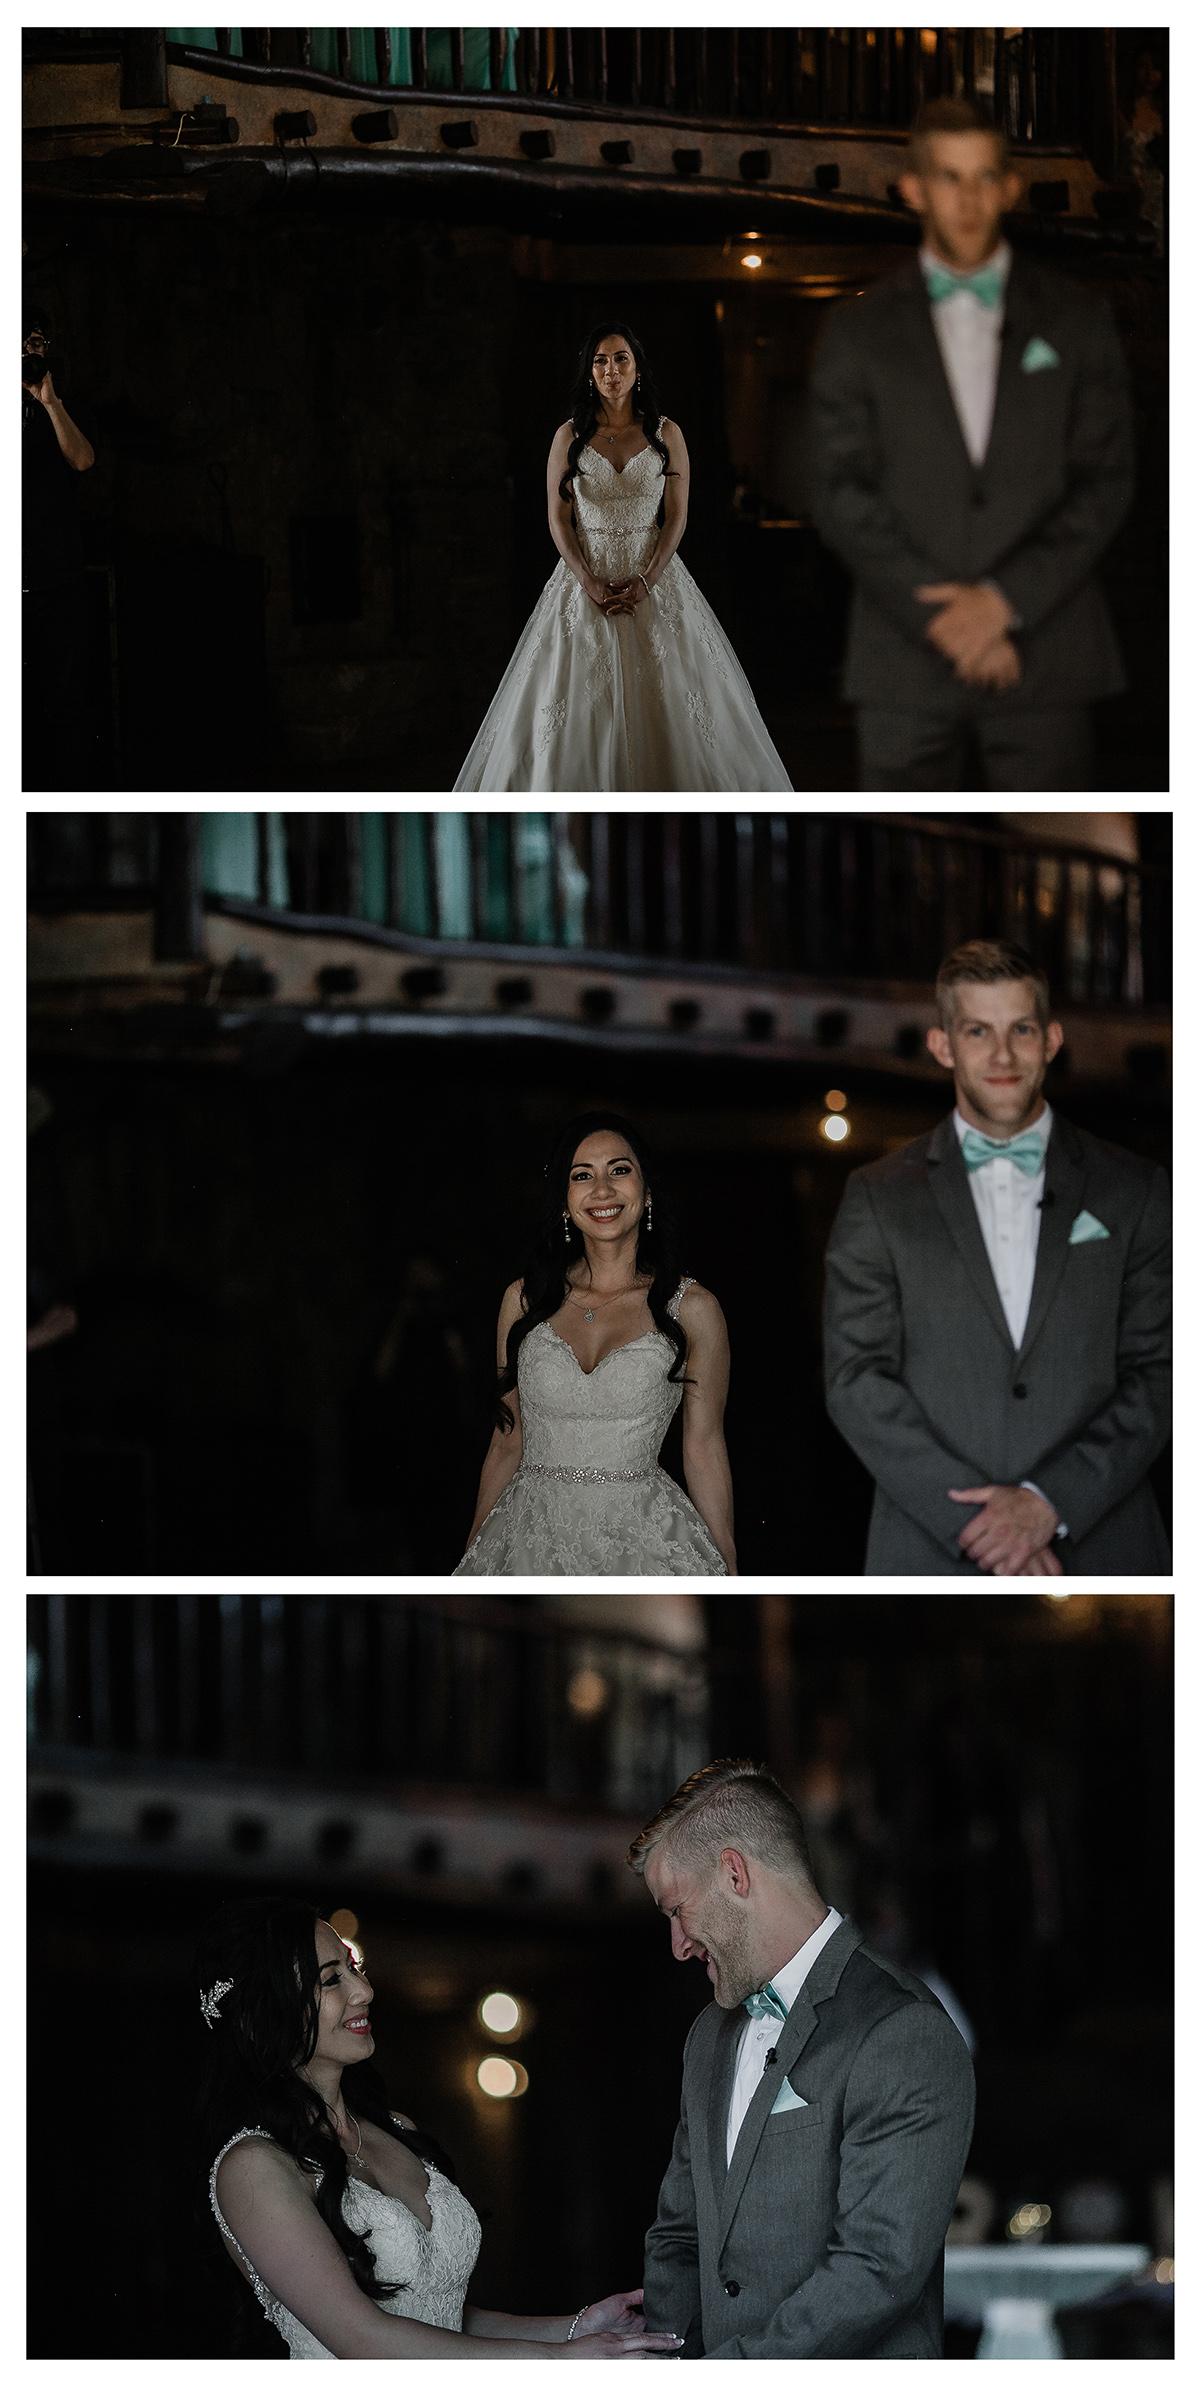 kristine_robert_wedding047.jpg